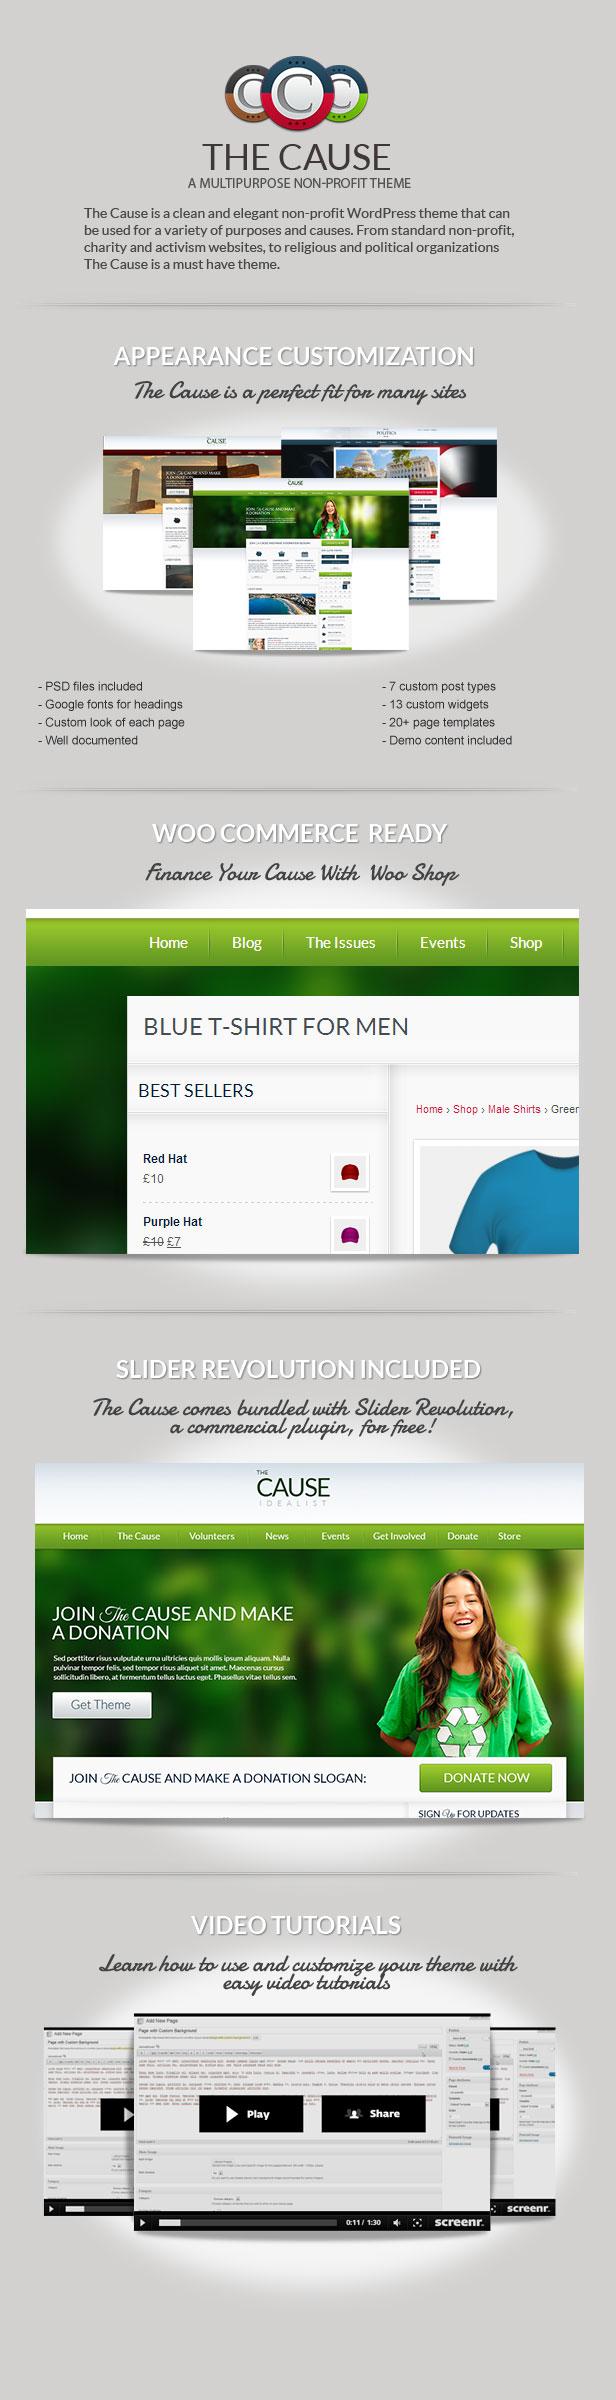 cause2 - The Cause - Non-Profit WordPress Theme